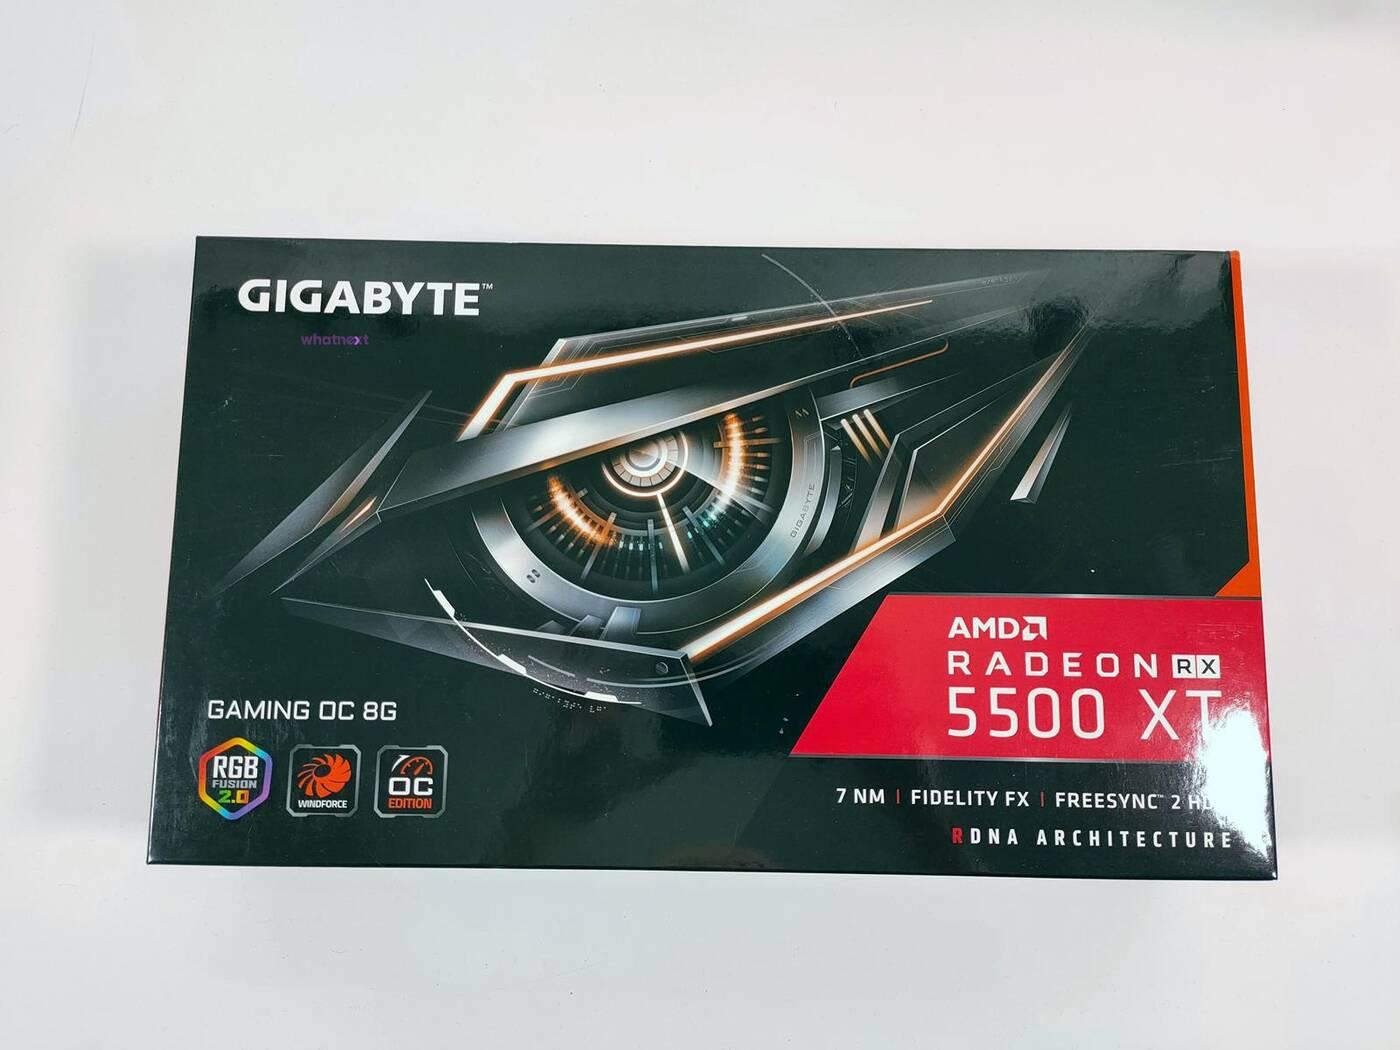 test Gigabyte Radeon RX 5500 XT Gaming OC 8G, recenzja Gigabyte Radeon RX 5500 XT Gaming OC 8G, review Gigabyte Radeon RX 5500 XT Gaming OC 8G, opinia Gigabyte Radeon RX 5500 XT Gaming OC 8G